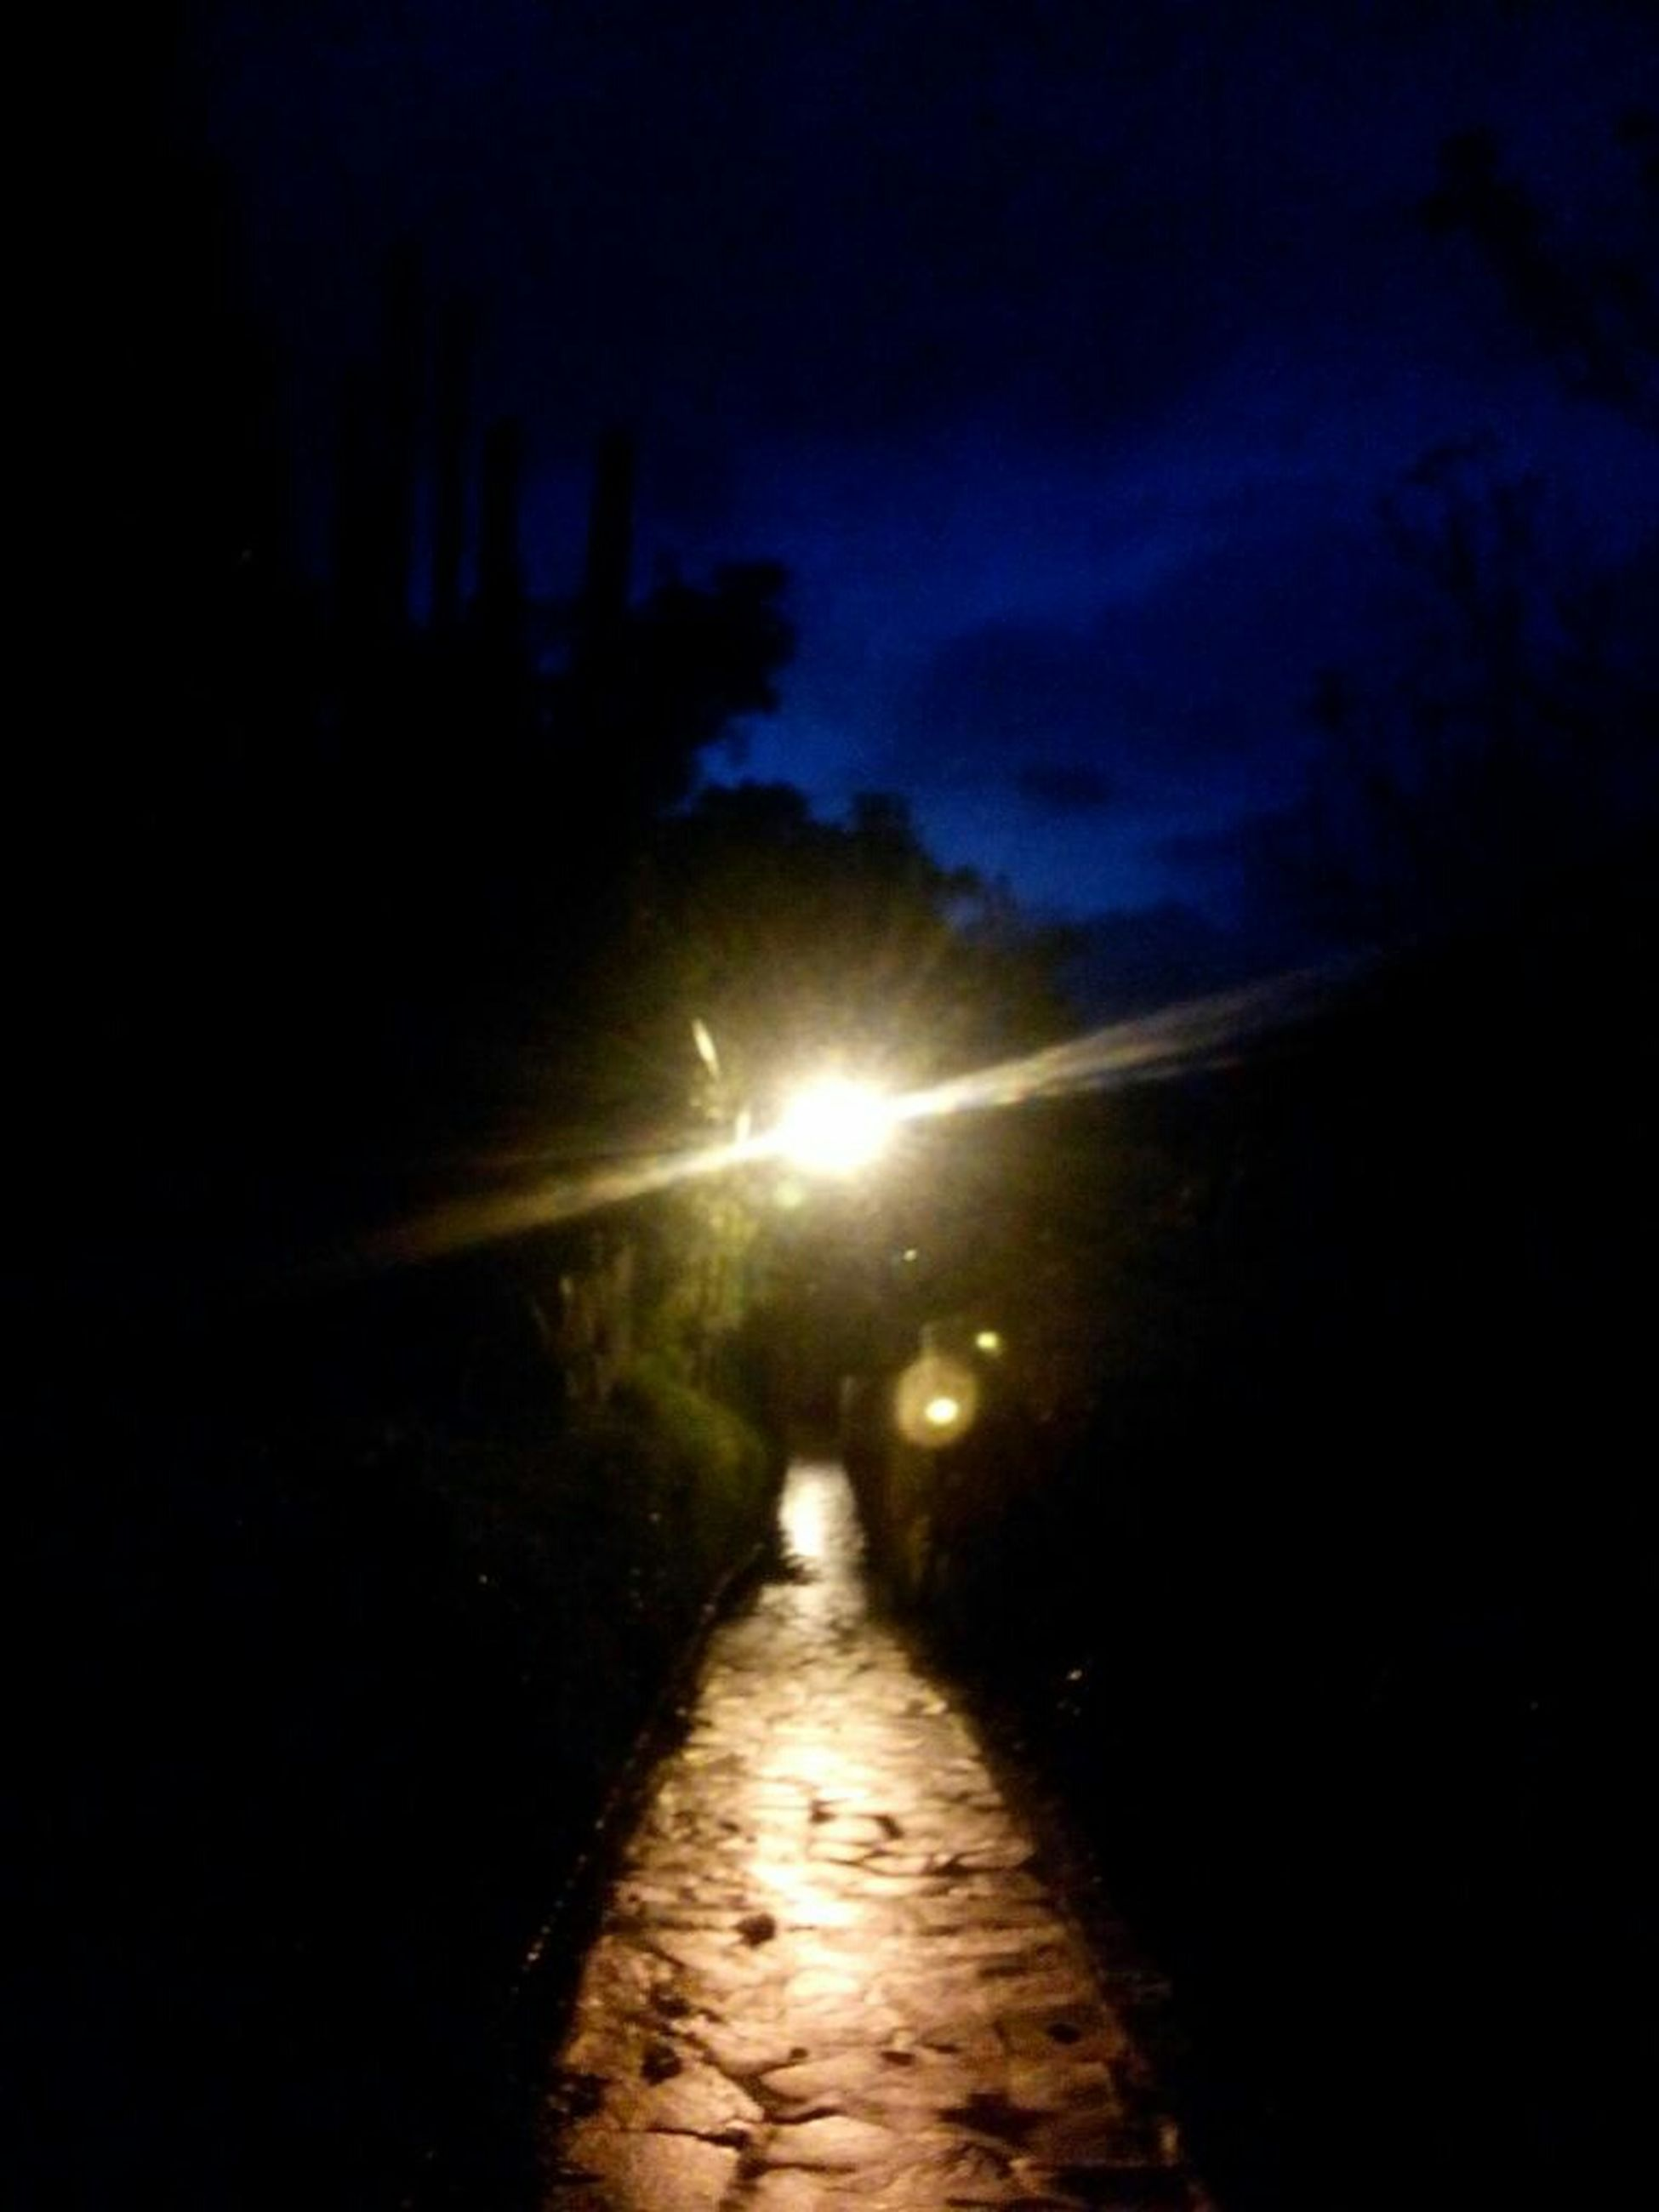 the way forward, night, sky, diminishing perspective, illuminated, vanishing point, silhouette, road, street, dark, street light, transportation, lens flare, sun, tranquility, nature, weather, outdoors, dusk, wet